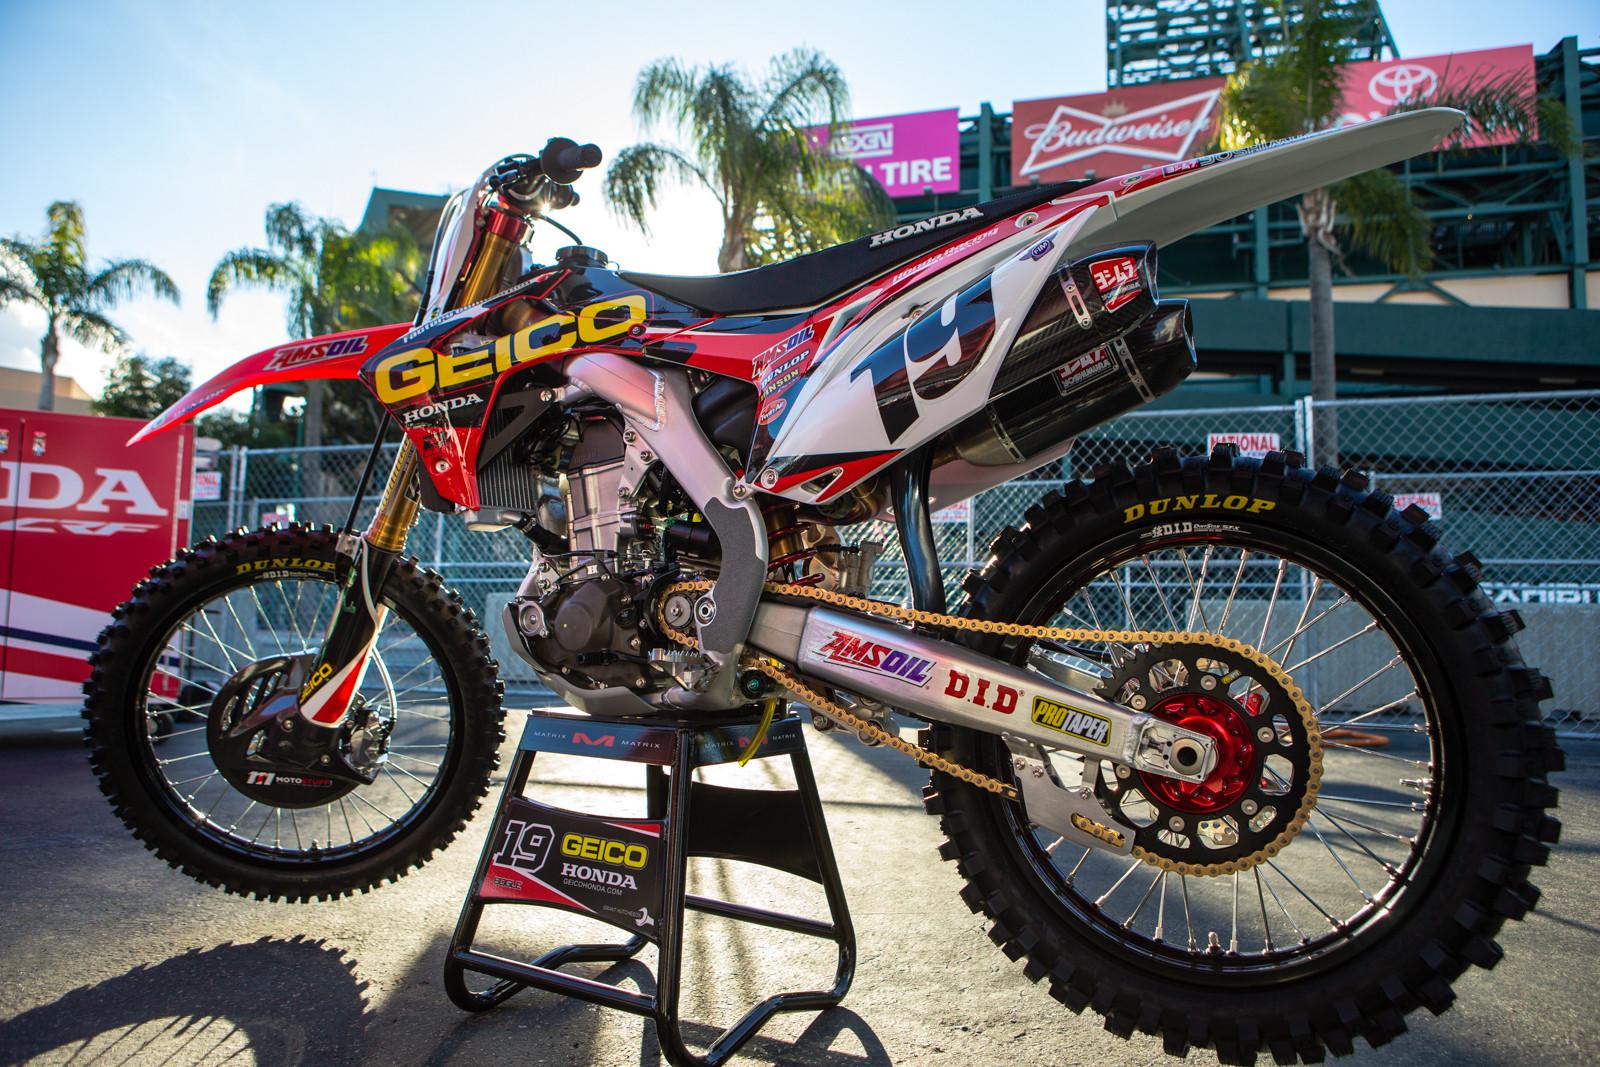 Justin Bogle - 2016 Bikes of Supercross - Motocross Pictures - Vital MX